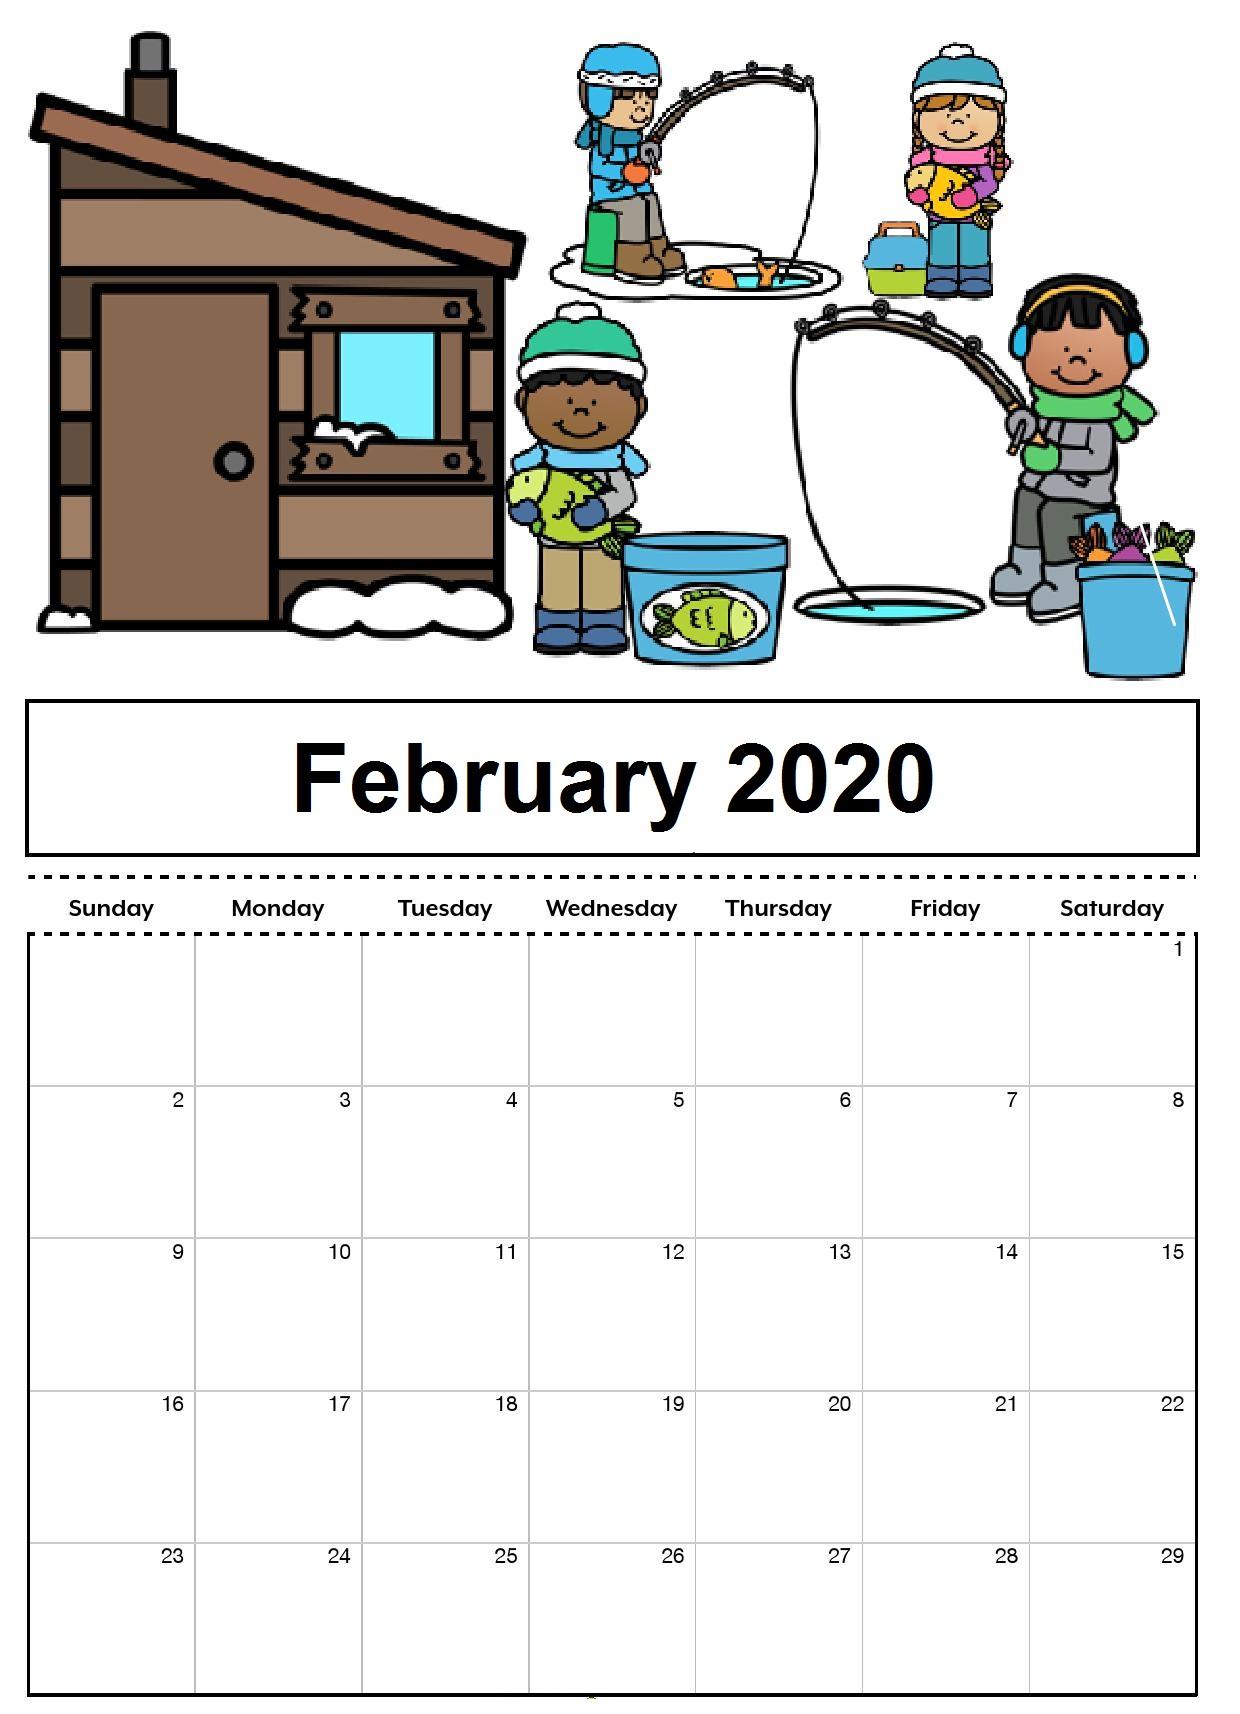 February 2020 Floral Calendar Template